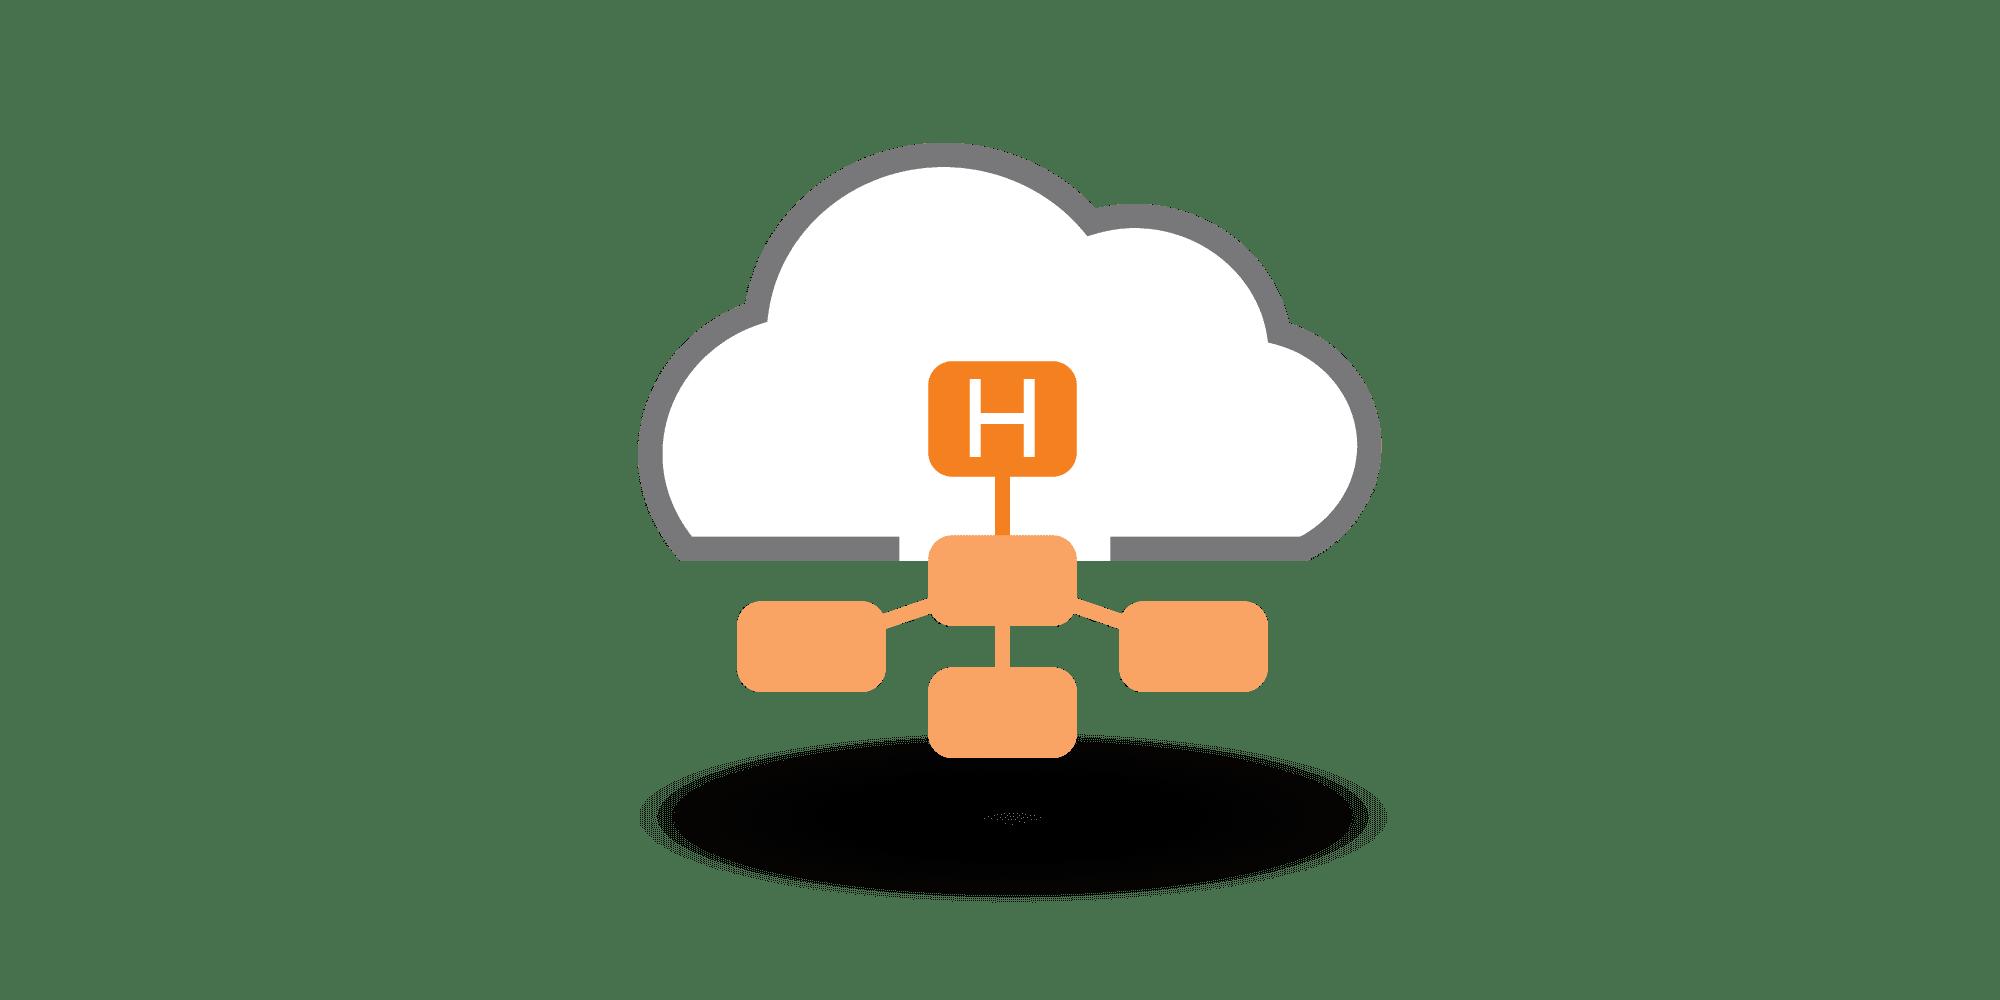 Youtube clipart health. Virtual smartzone high scale